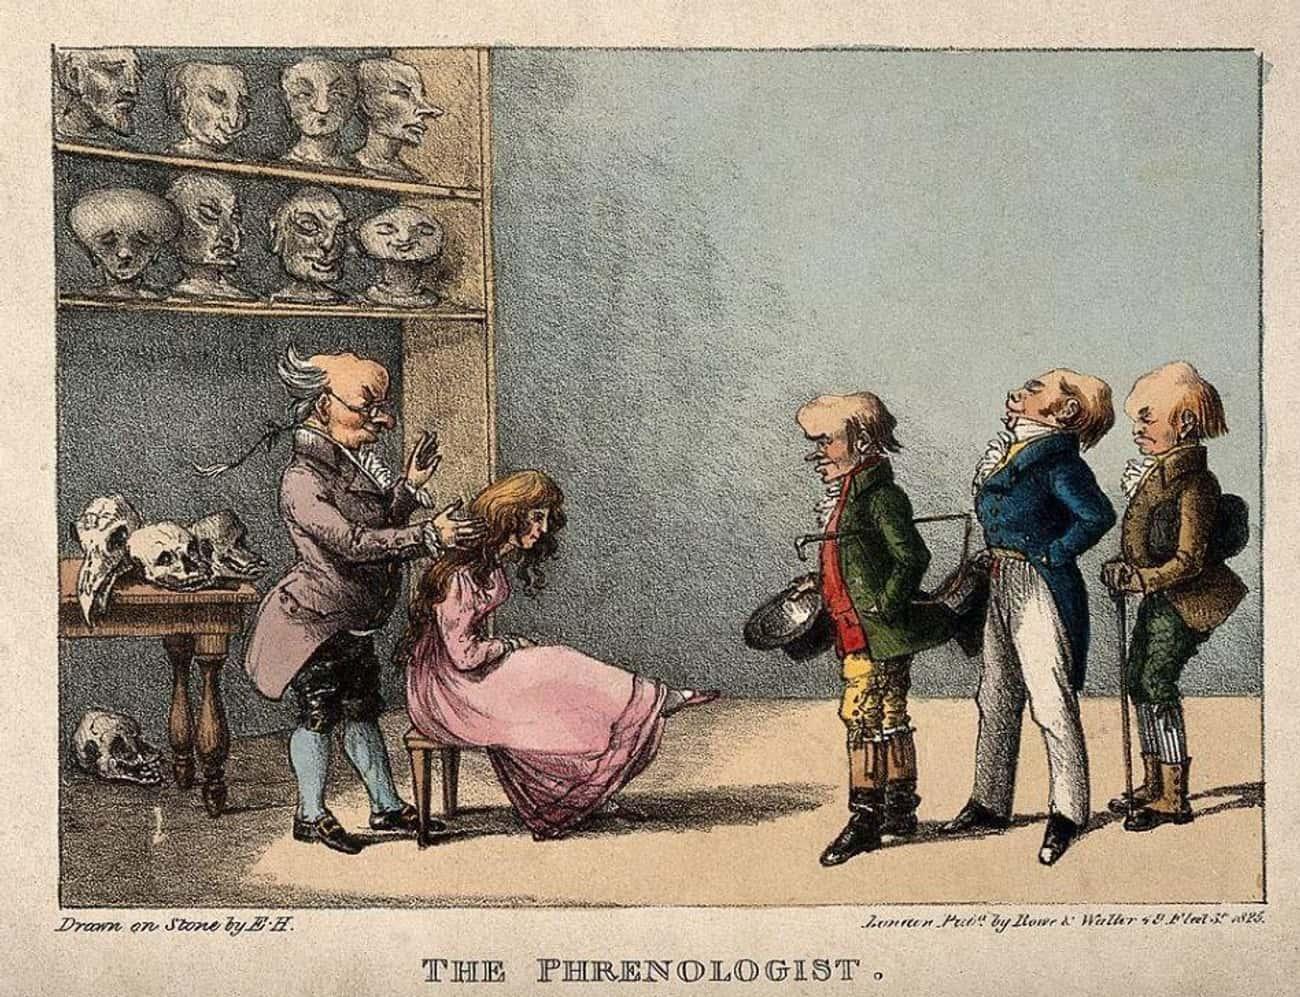 Franz Joseph Gall Created The Theory Of Phrenology